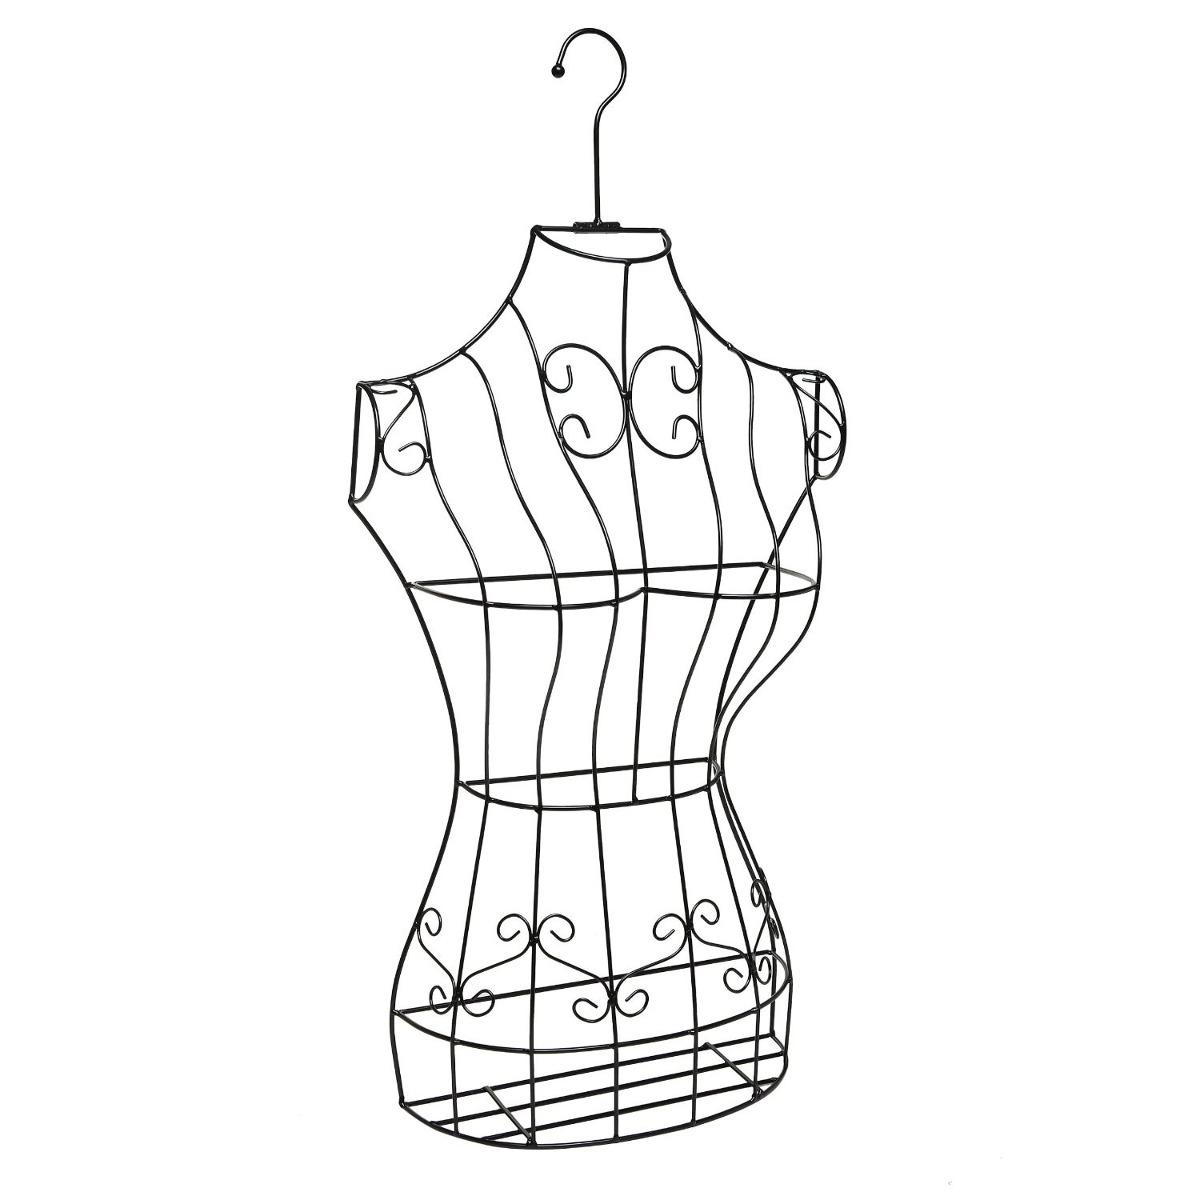 Maniqui torso elegante alambre vestido bonito metal mujer 1 en mercado libre - Perchero maniqui ...